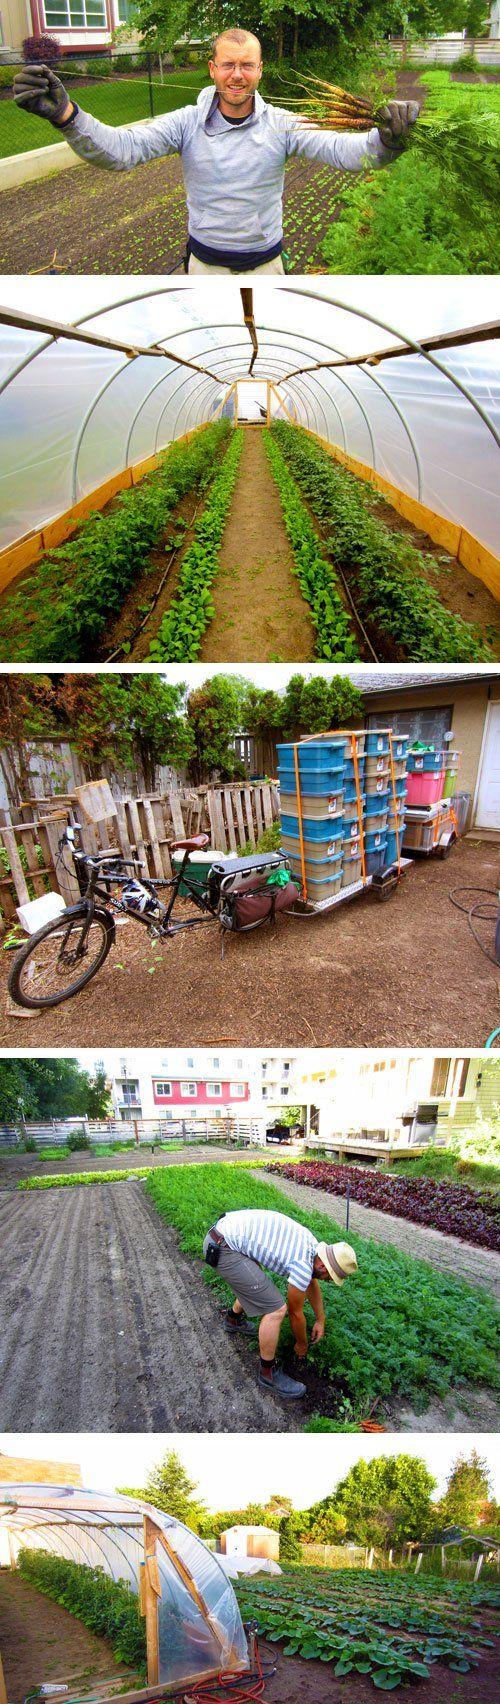 Spin Method Of Urban Farming Helps Novice Farmers Profit In The City Backyard Farming Urban Farming Garden Urban backyard farming for profit